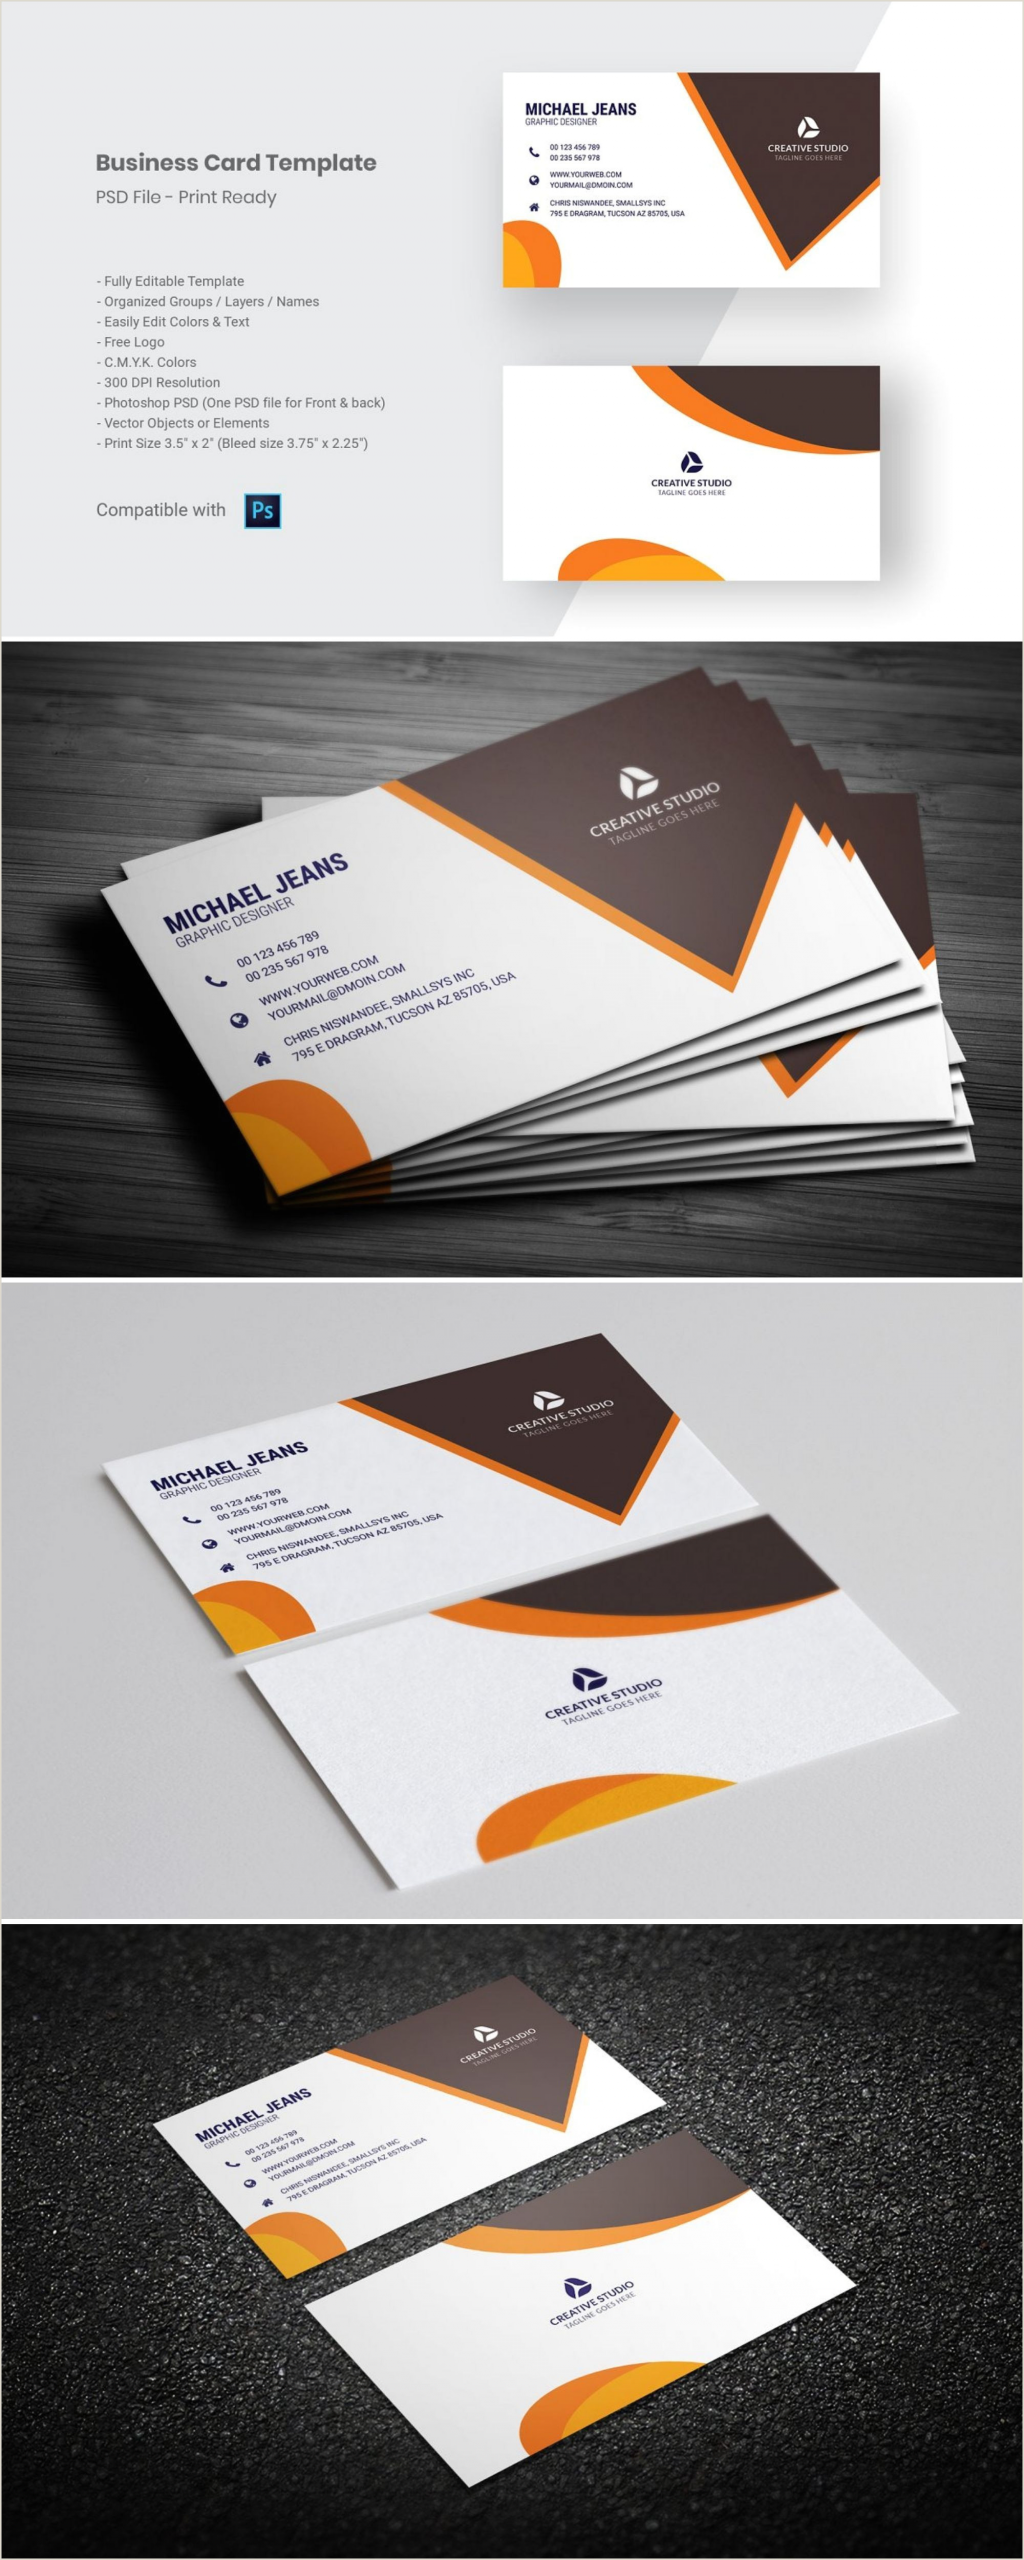 Personal Business Card Design Modern Business Card Template